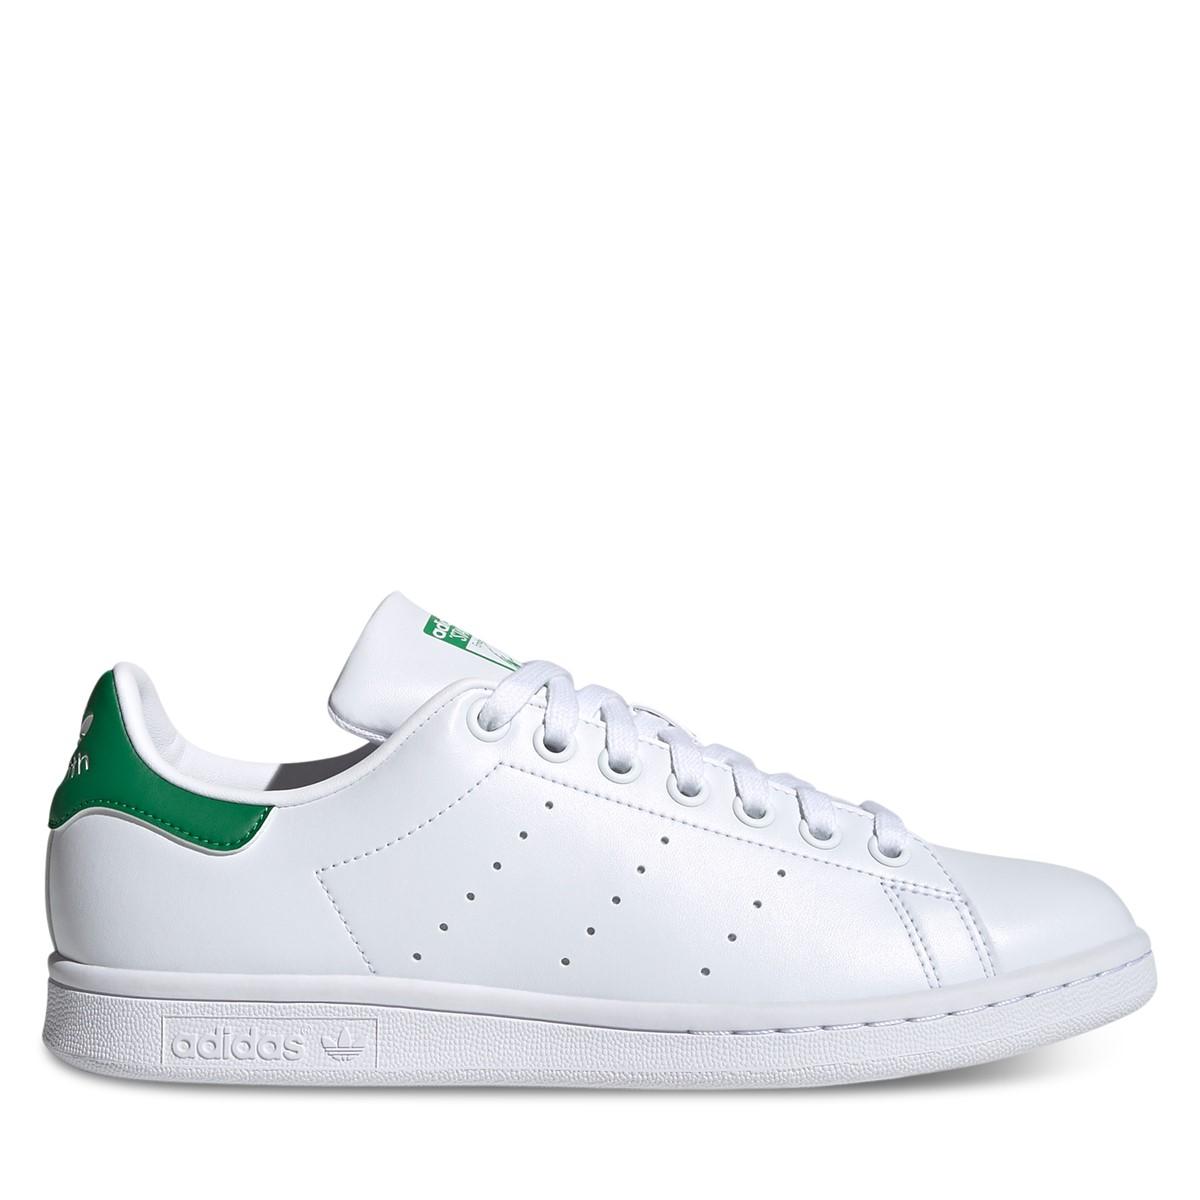 Women's Stan Smith Primegreen Sneakers in White/Green